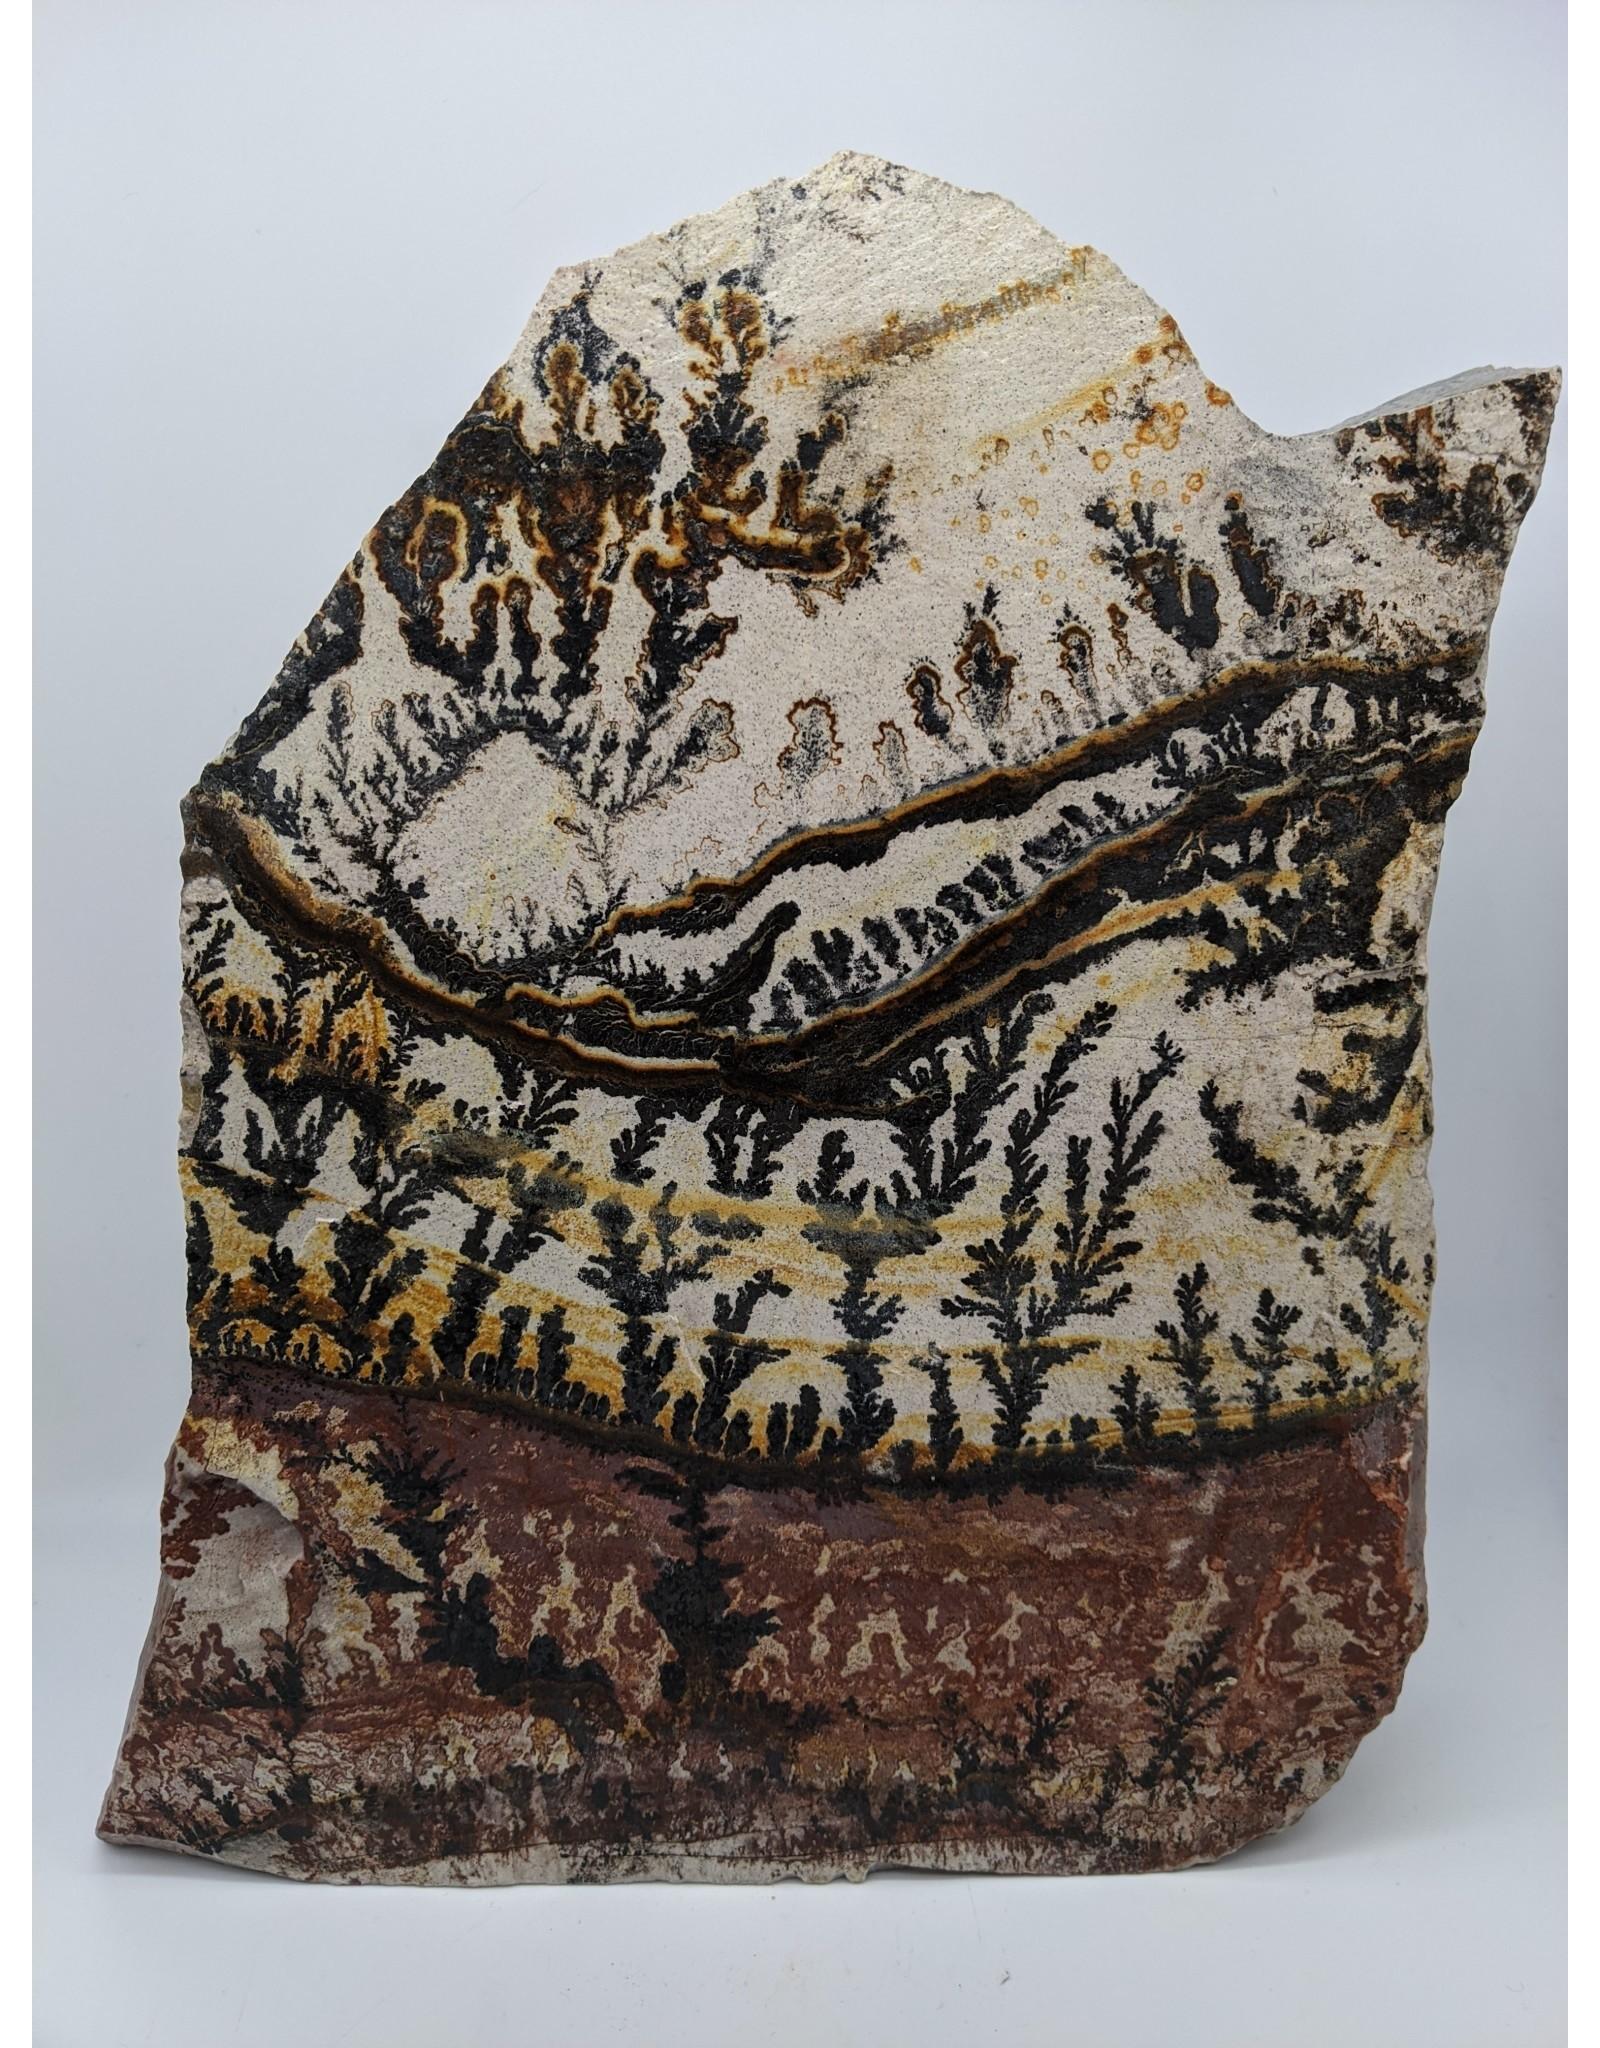 Dendritic Rhyolite, Manganese & Iron Oxide (Utah, USA)